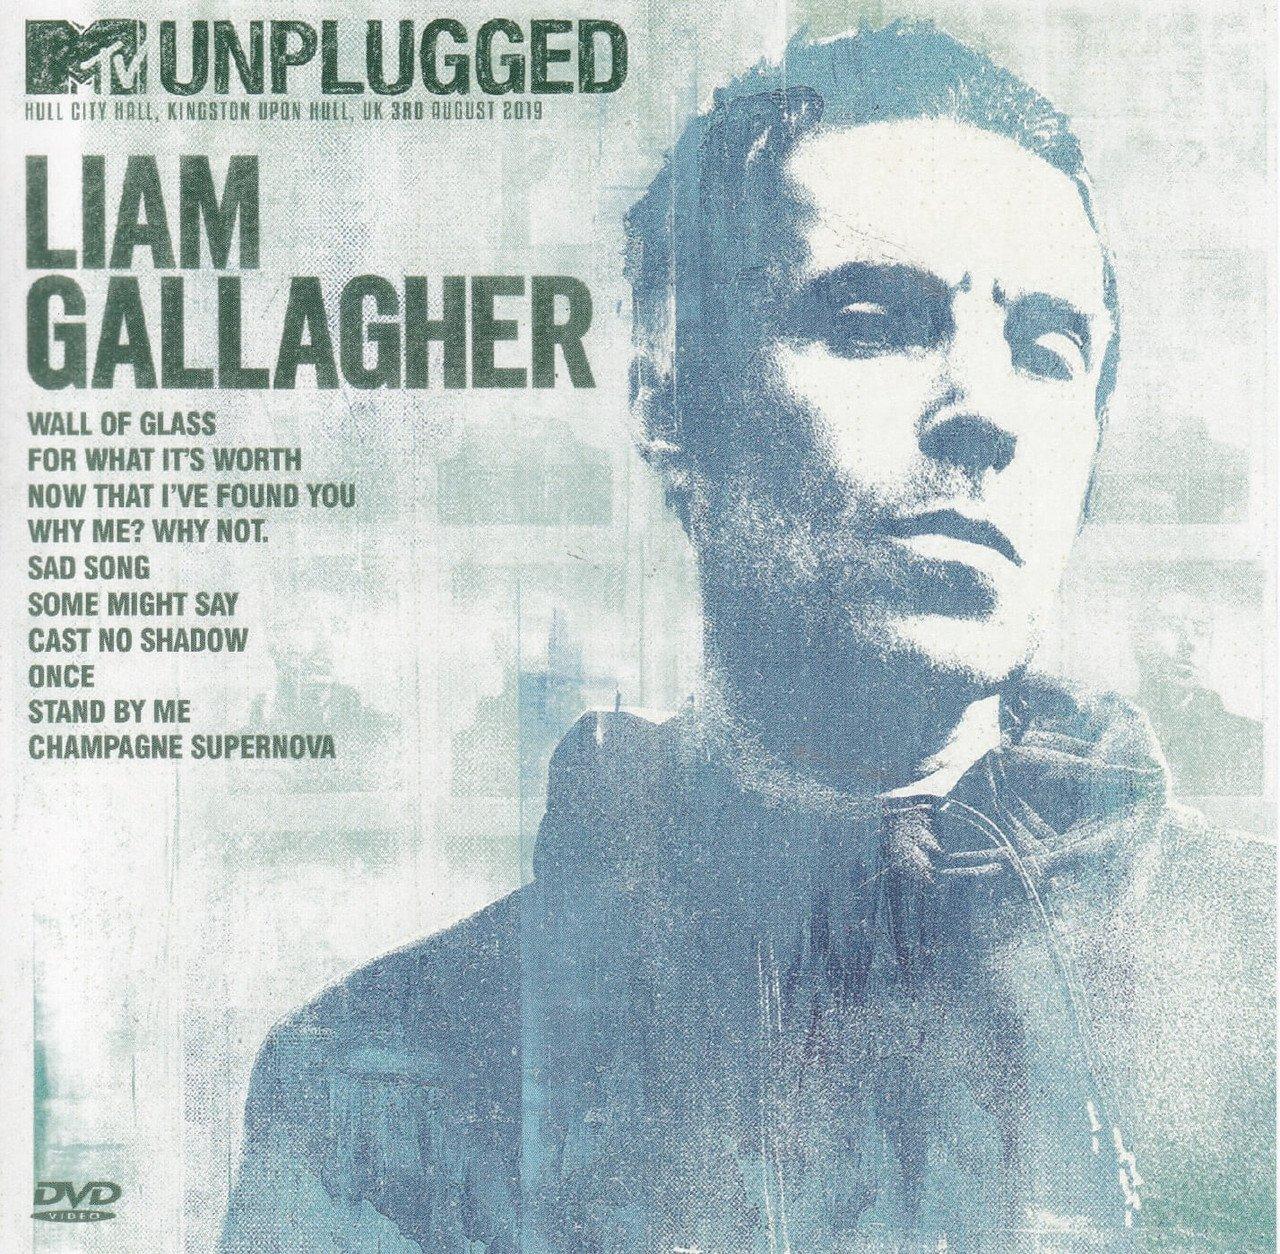 Liam Gallagher lanza 'MTV Unplugged', su nuevo álbum - VAVEL Media ...